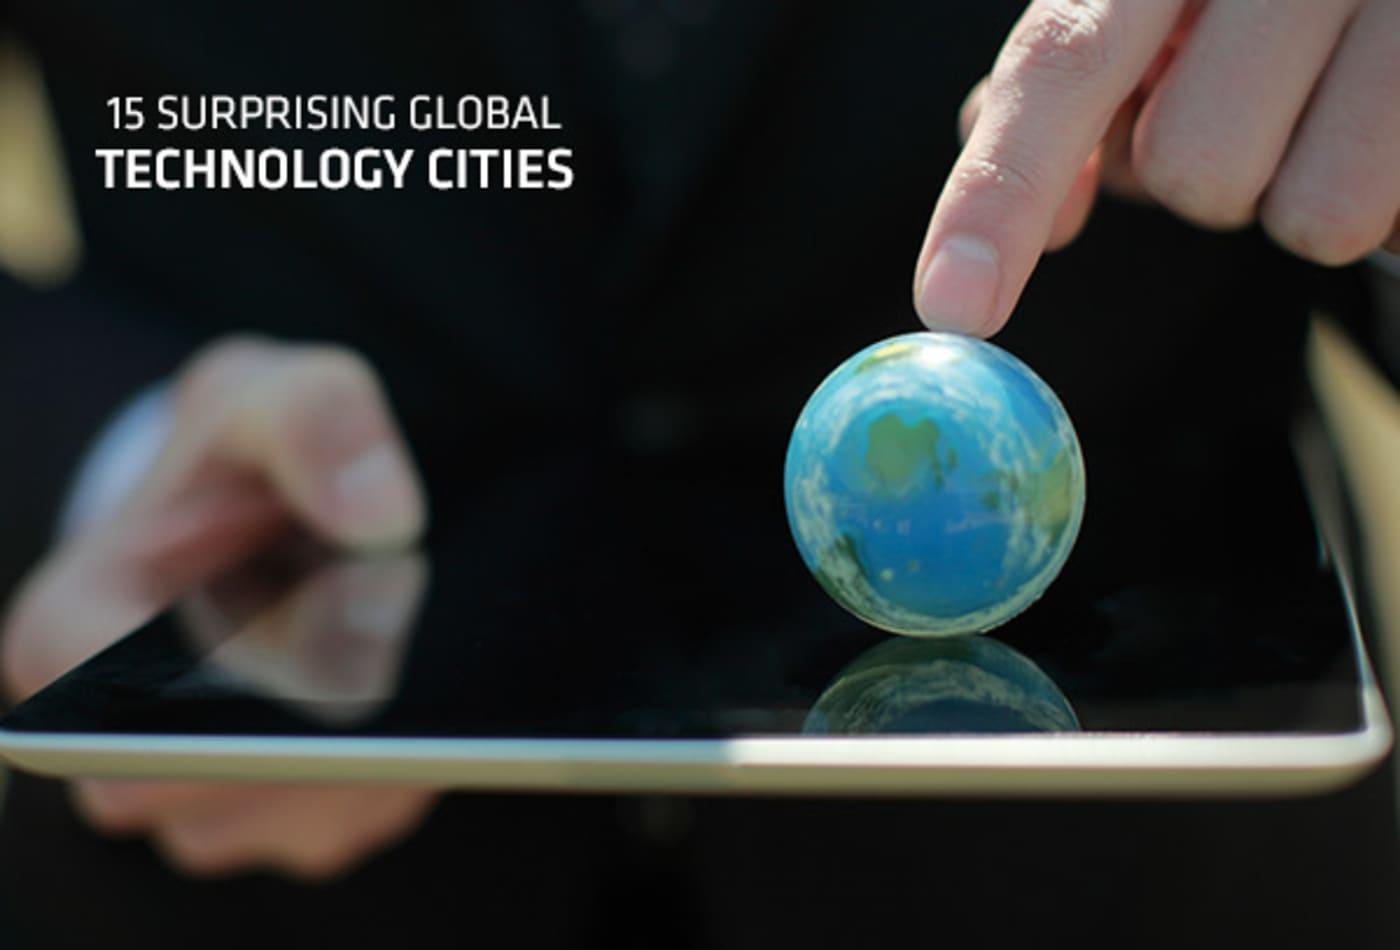 High-Tech-Growth-Cities-cover.jpg